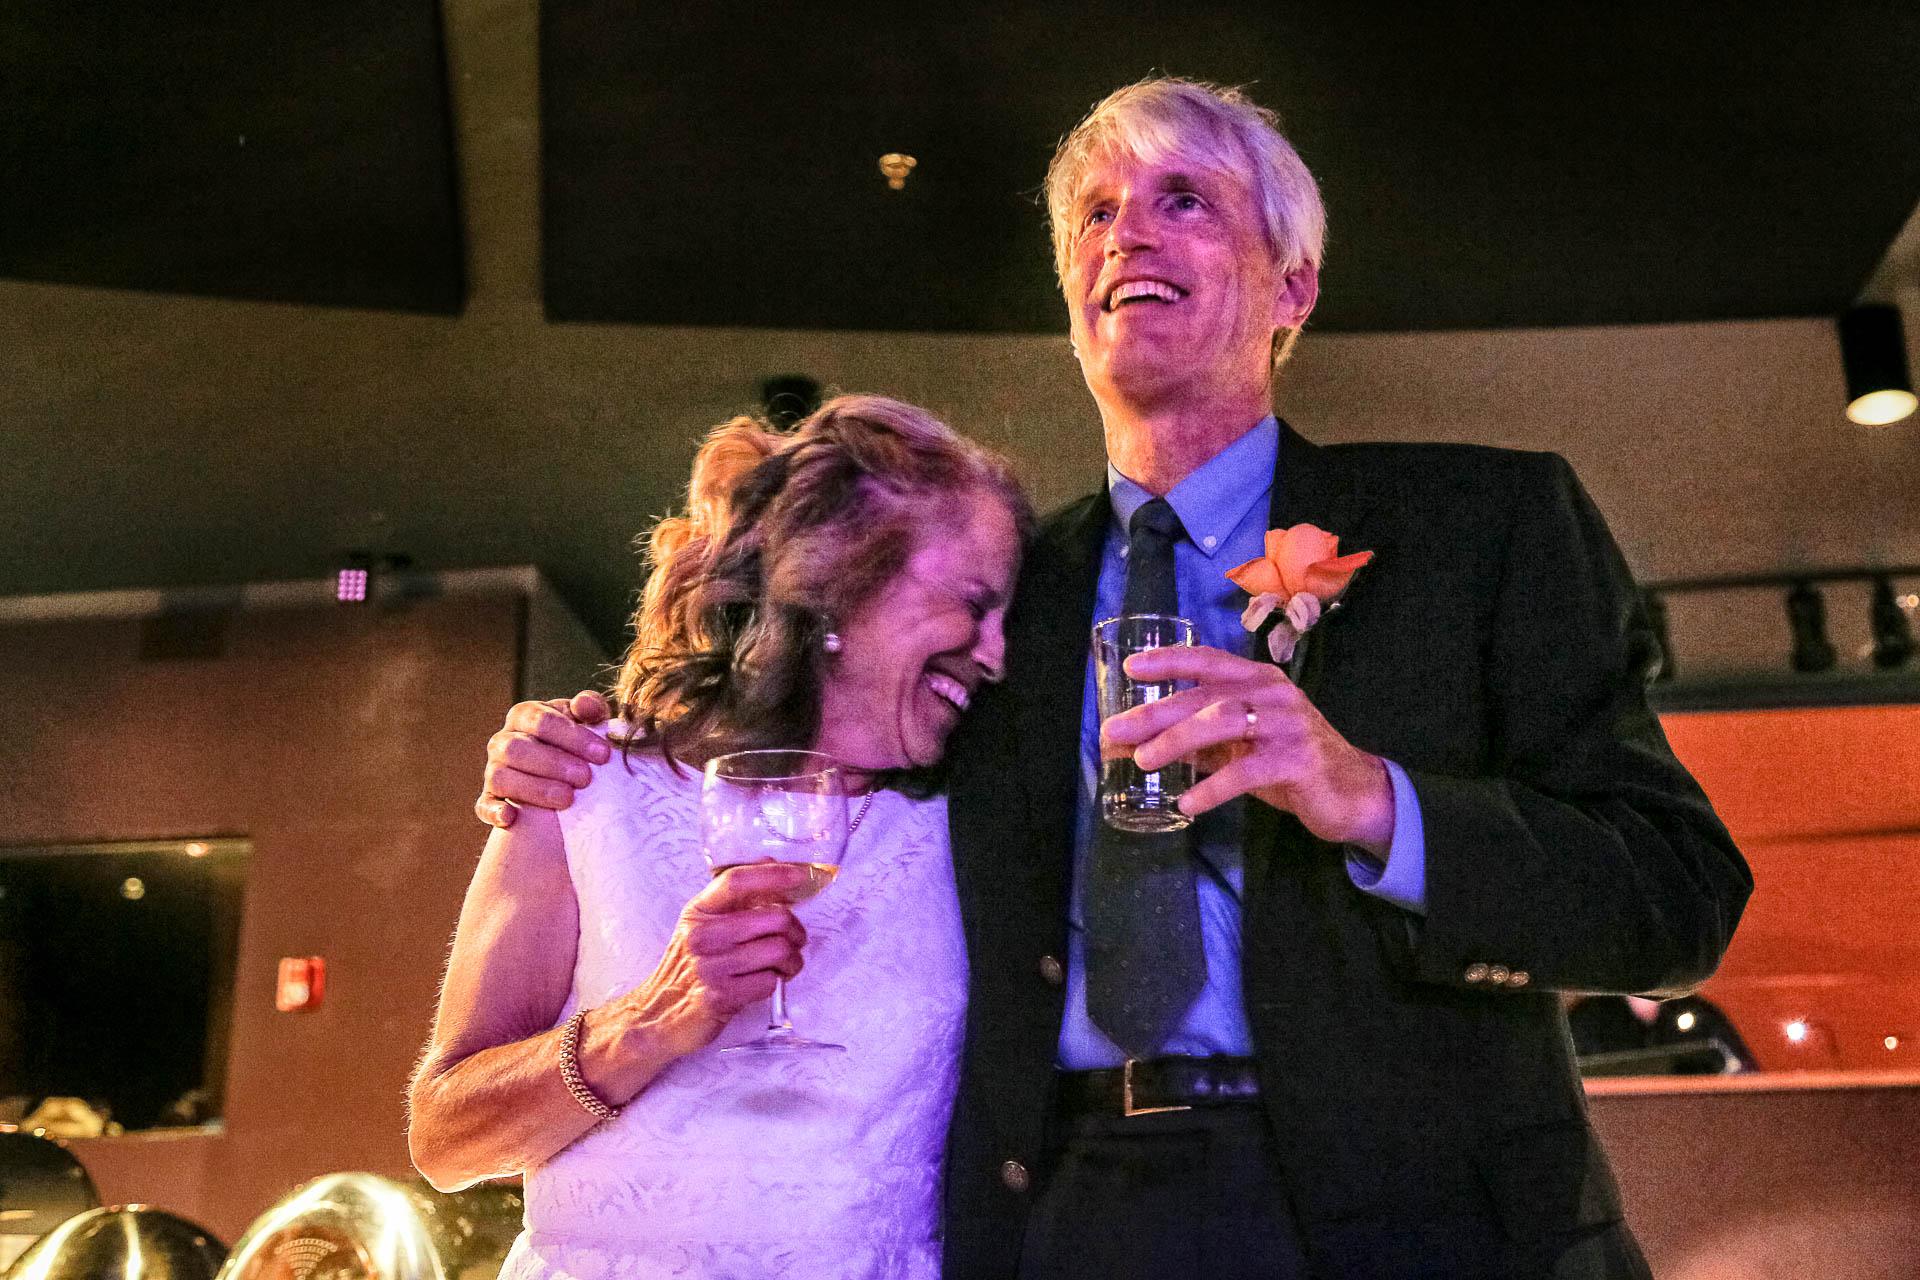 WEDDING-Karen-Mark-28Sep2014-MTO0493-Edit-2-Edit.jpg